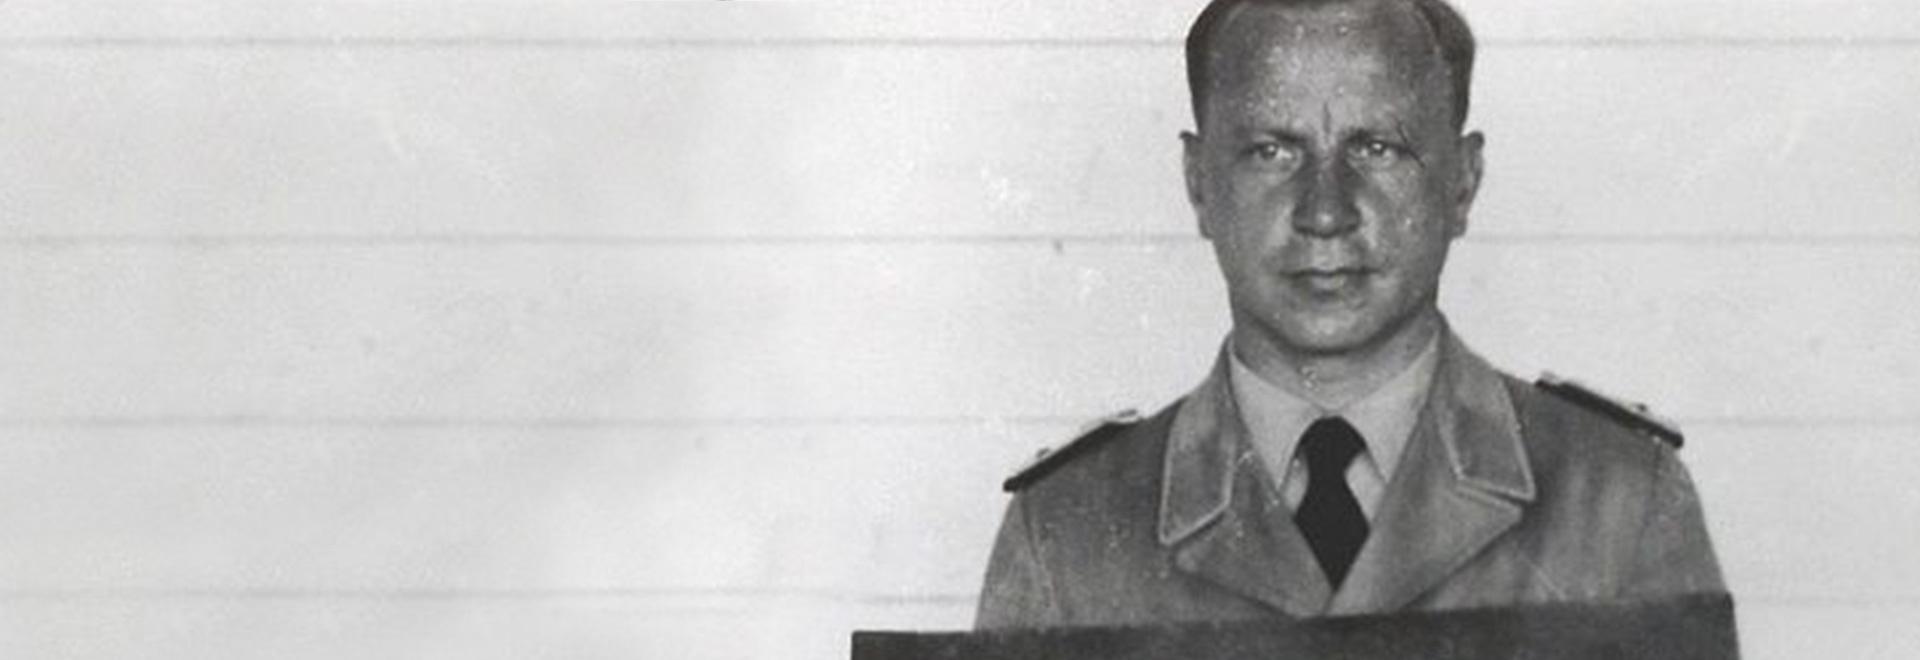 Kappler, prigioniero di guerra in fuga